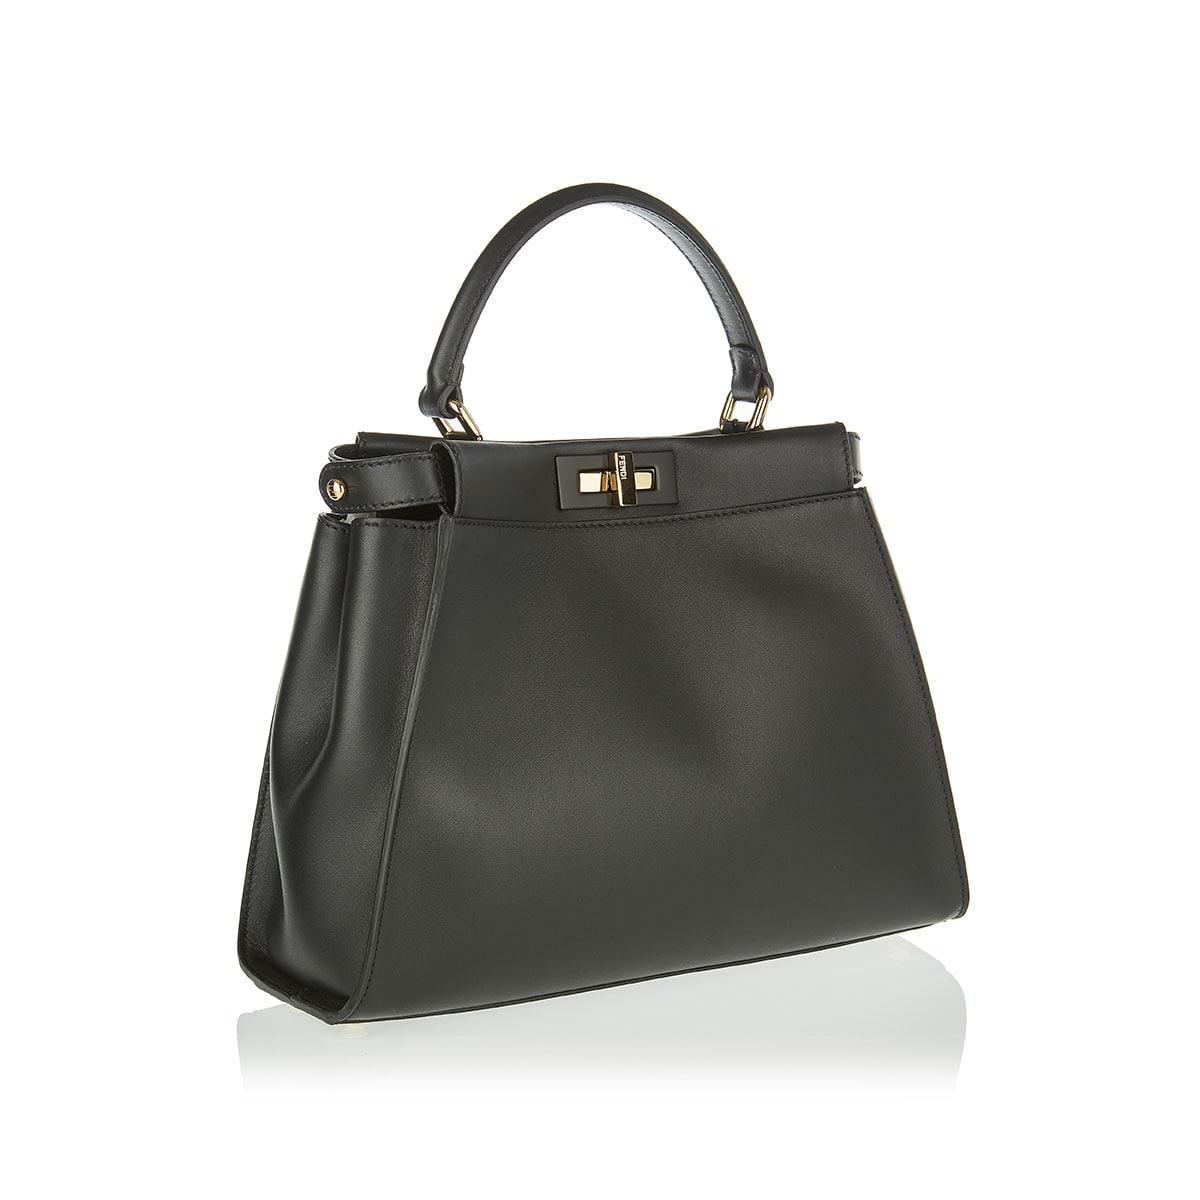 Iconic Peekaboo medium top-handle bag